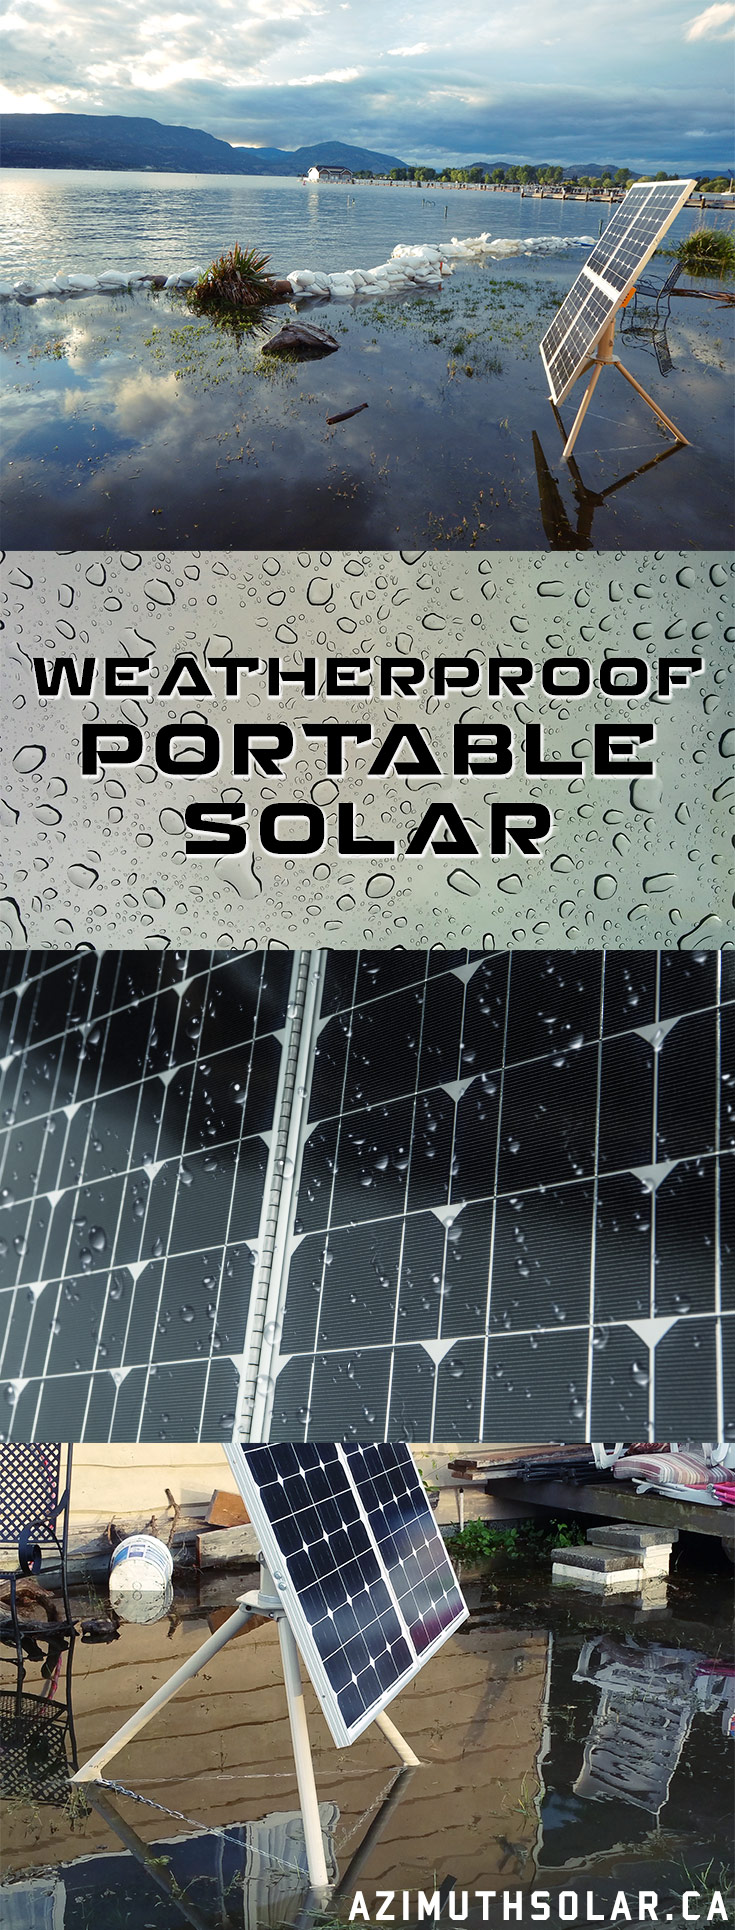 We're Weatherproofing Portable Solar